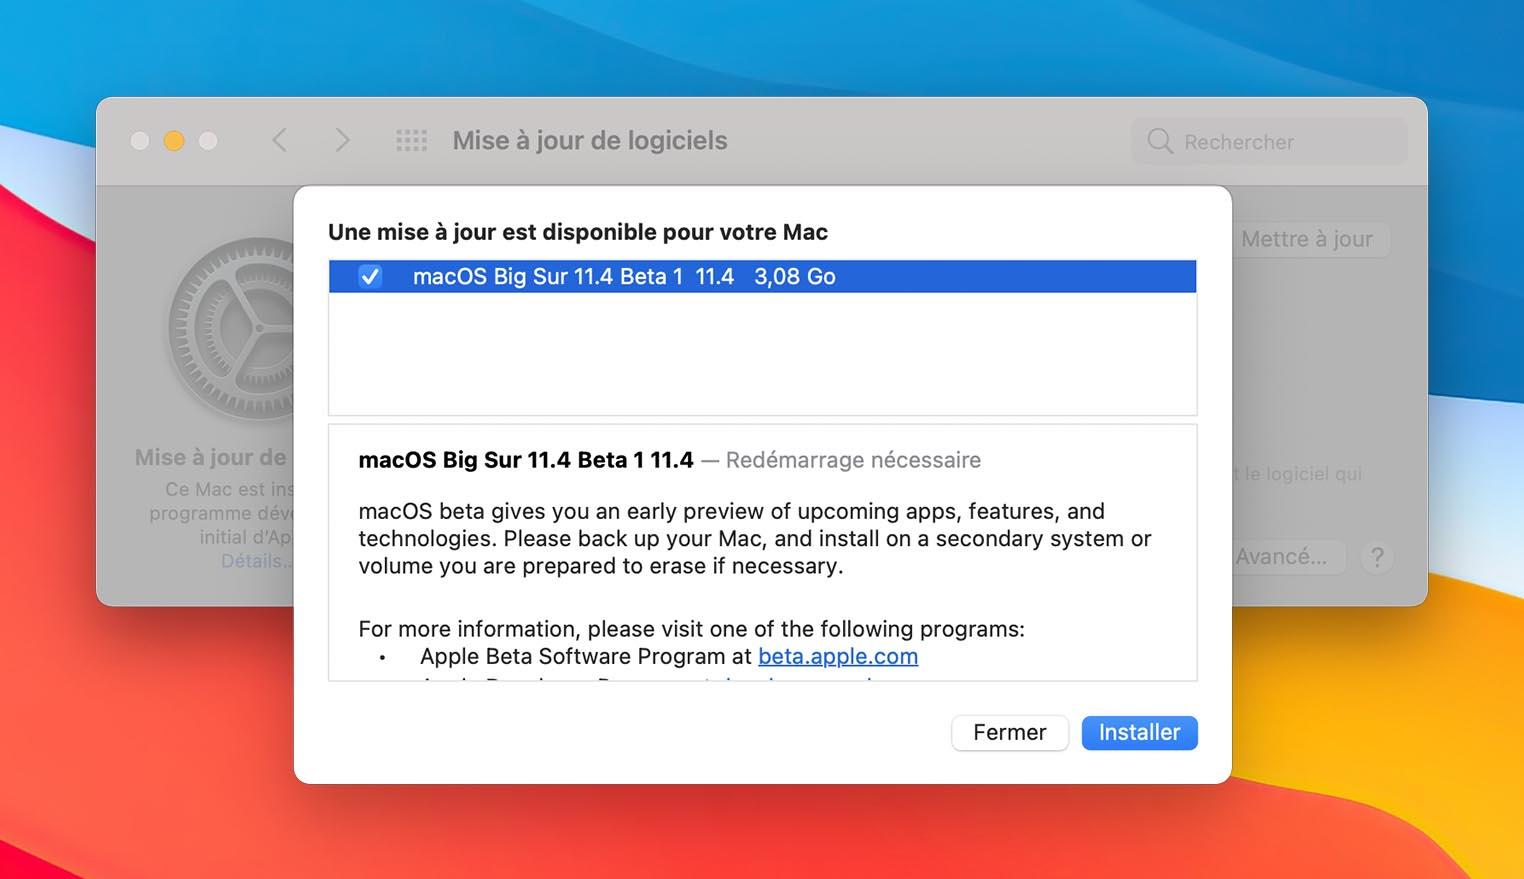 macOS 11.4 Bêta 1